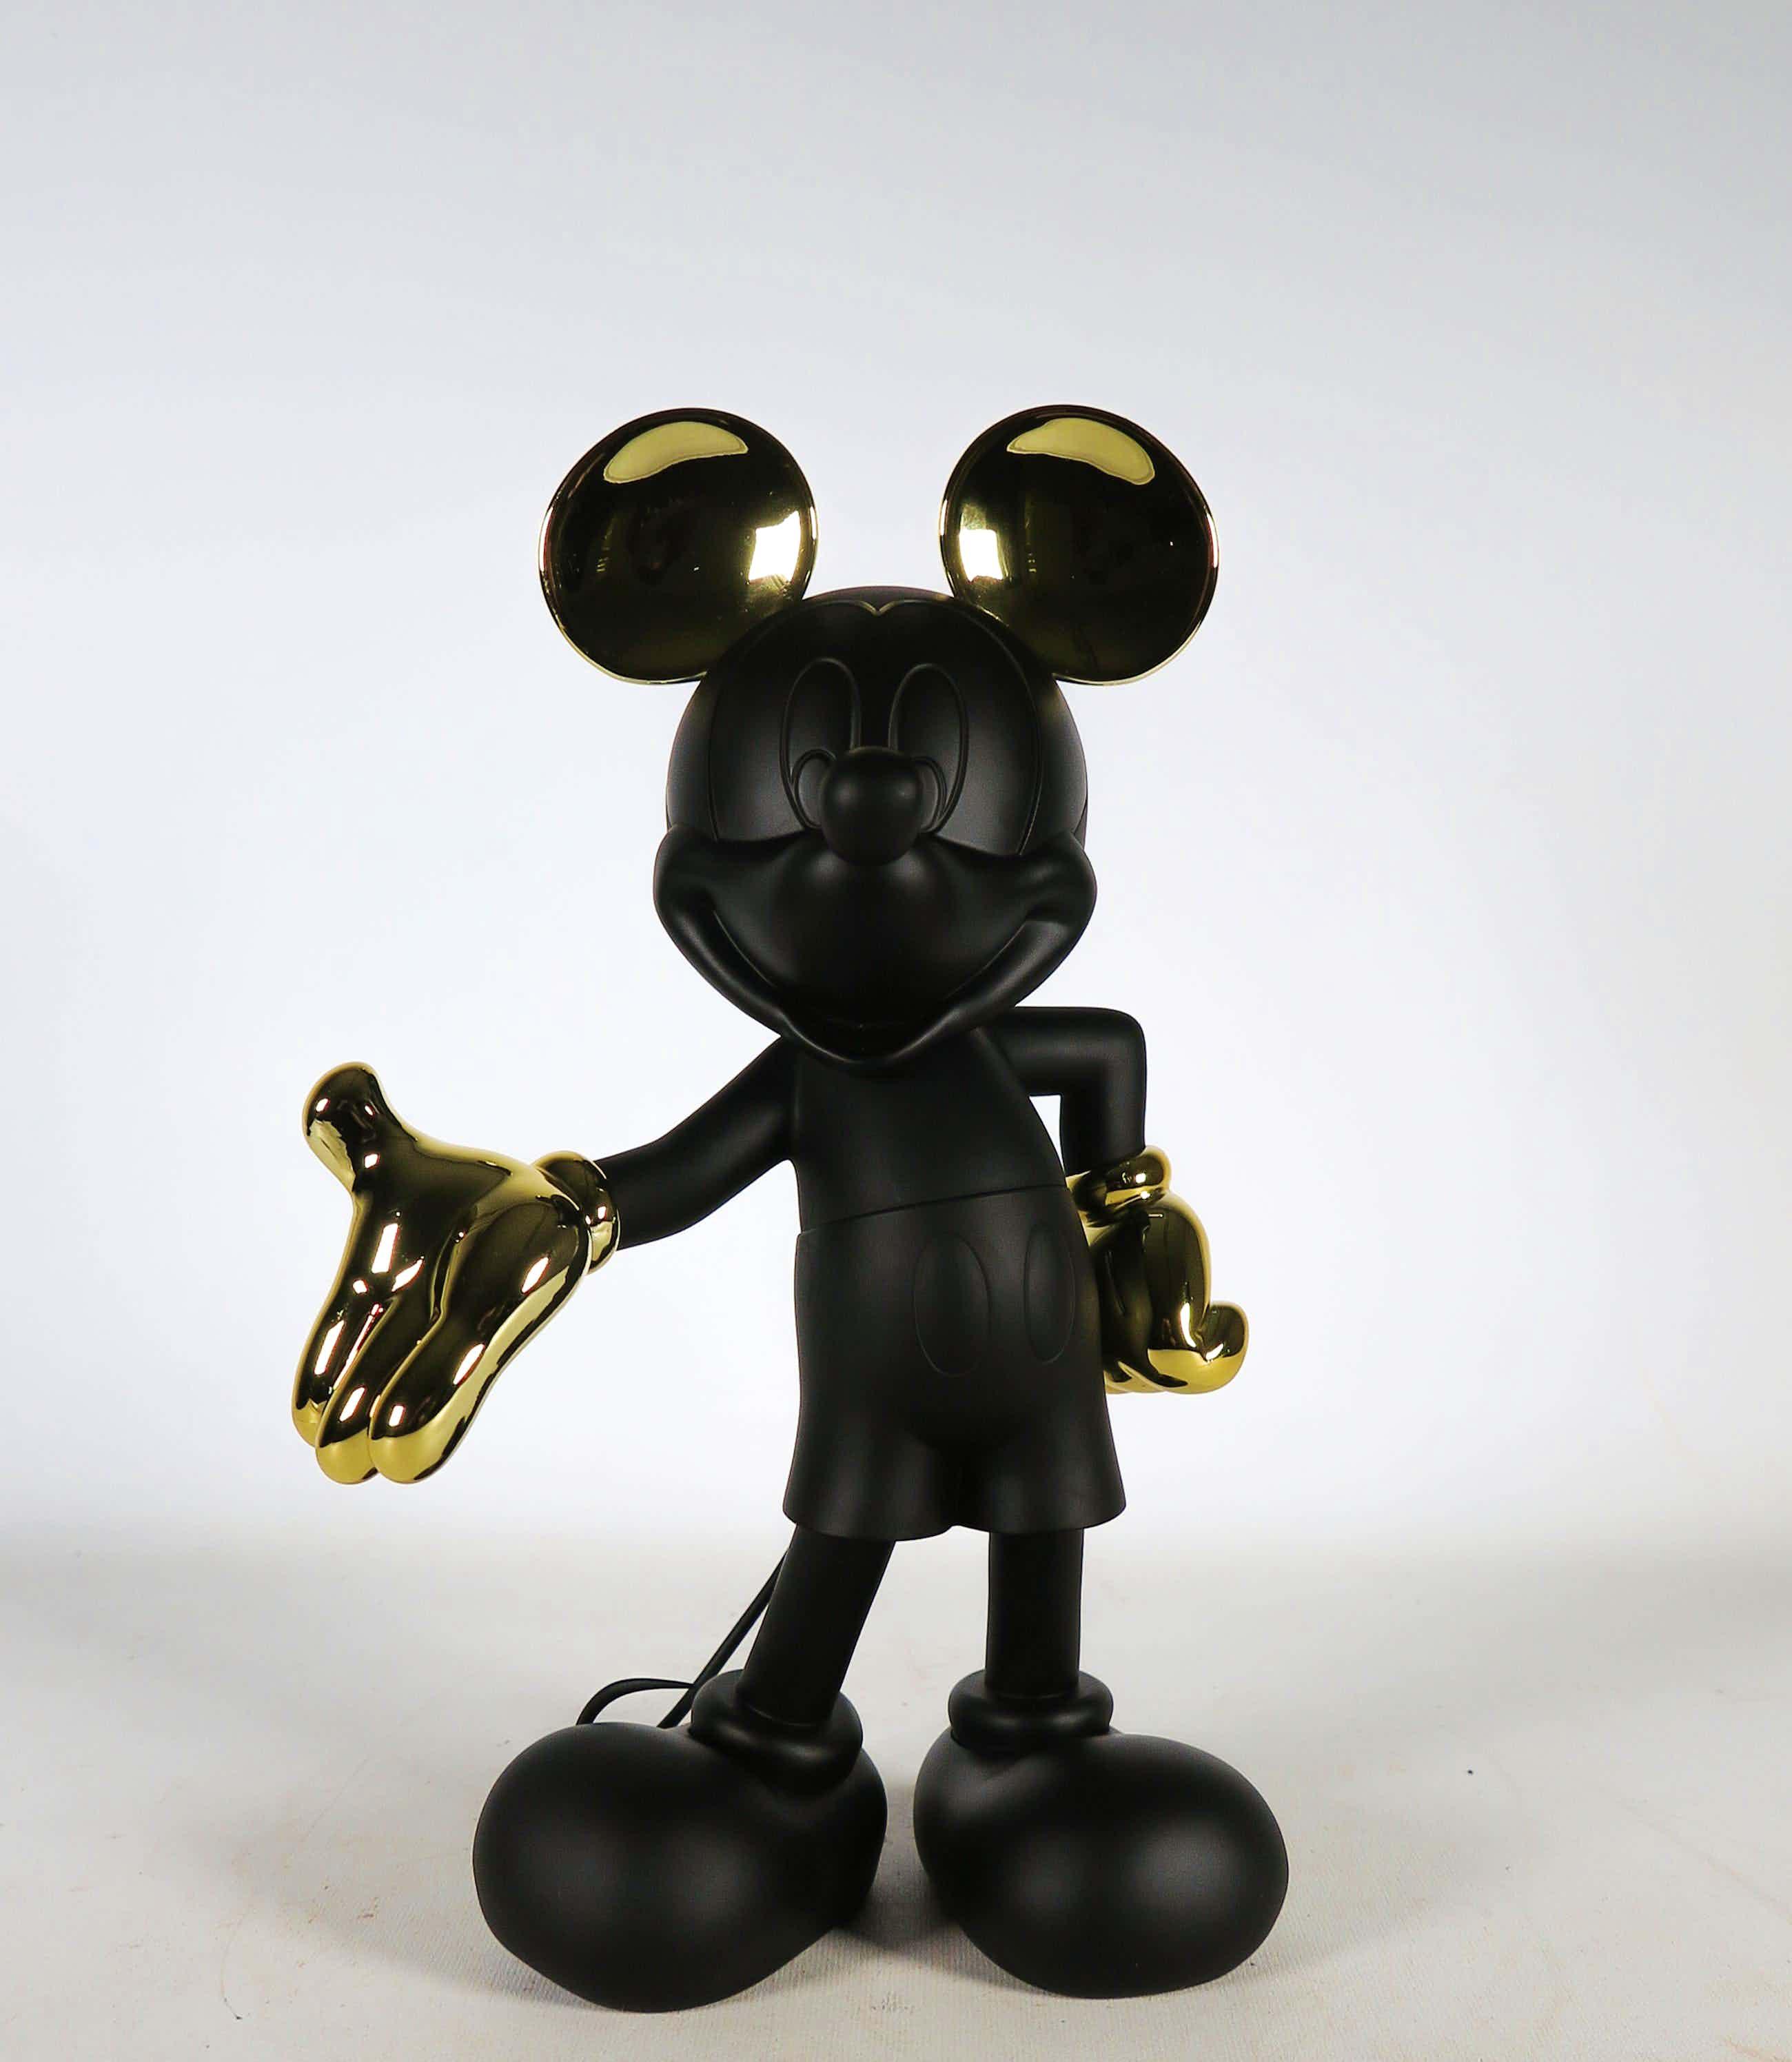 Walt Disney - Disney - Leblon Delienne - Mickey Welcome Bicolor kopen? Bied vanaf 110!